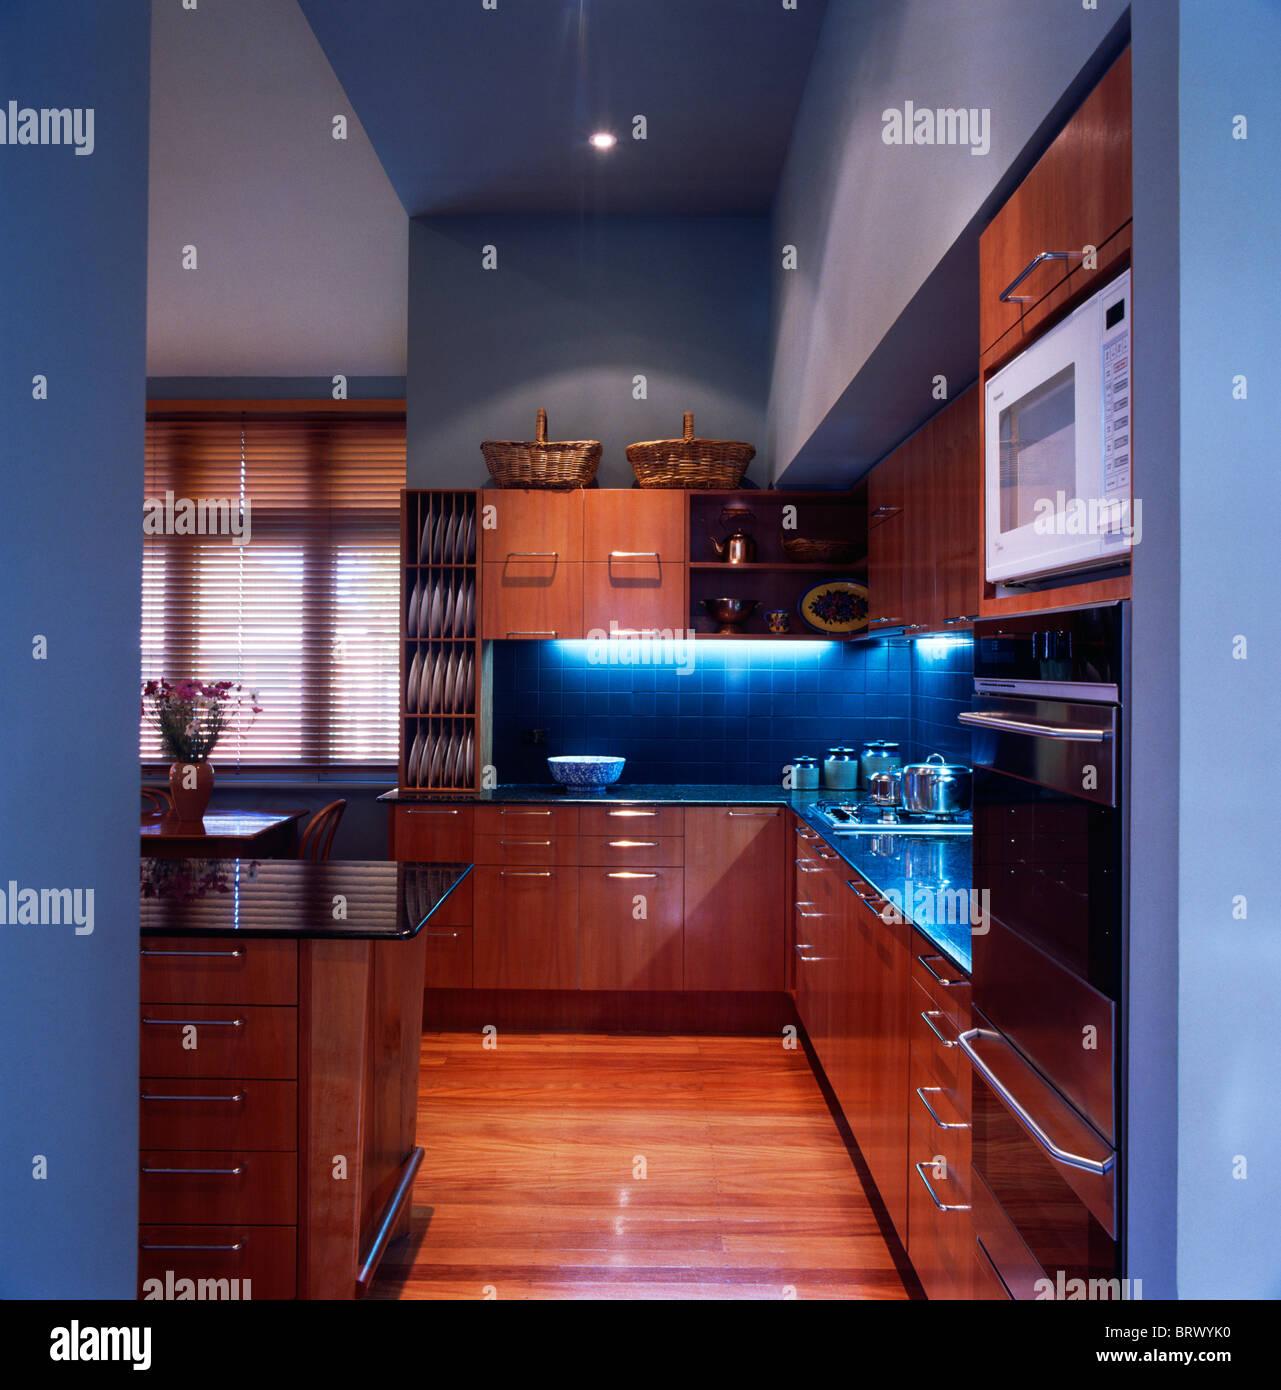 Splash Back Kitchen Stockfotos & Splash Back Kitchen Bilder - Seite ...